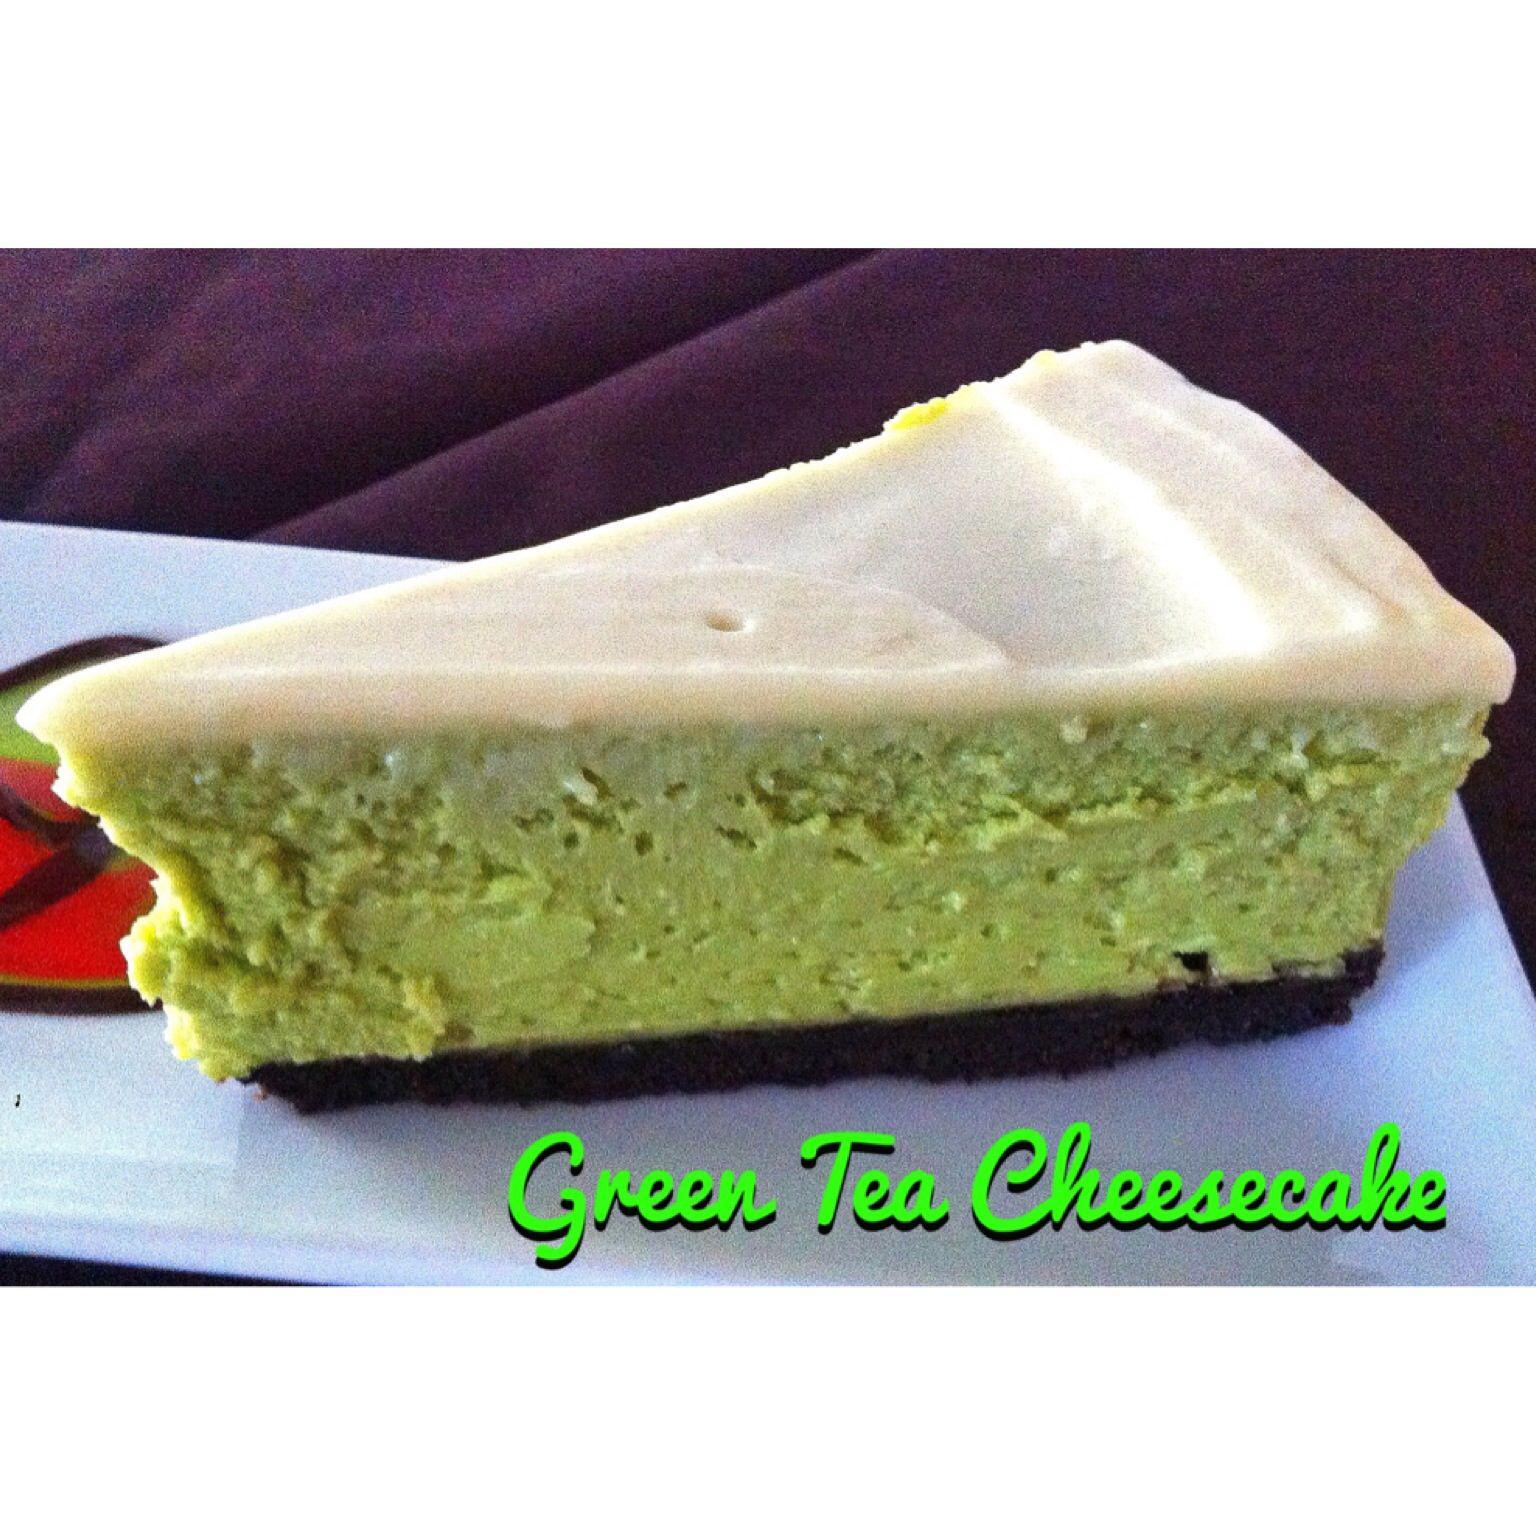 Green tea cheesecake cheesecake green tea cheesecake